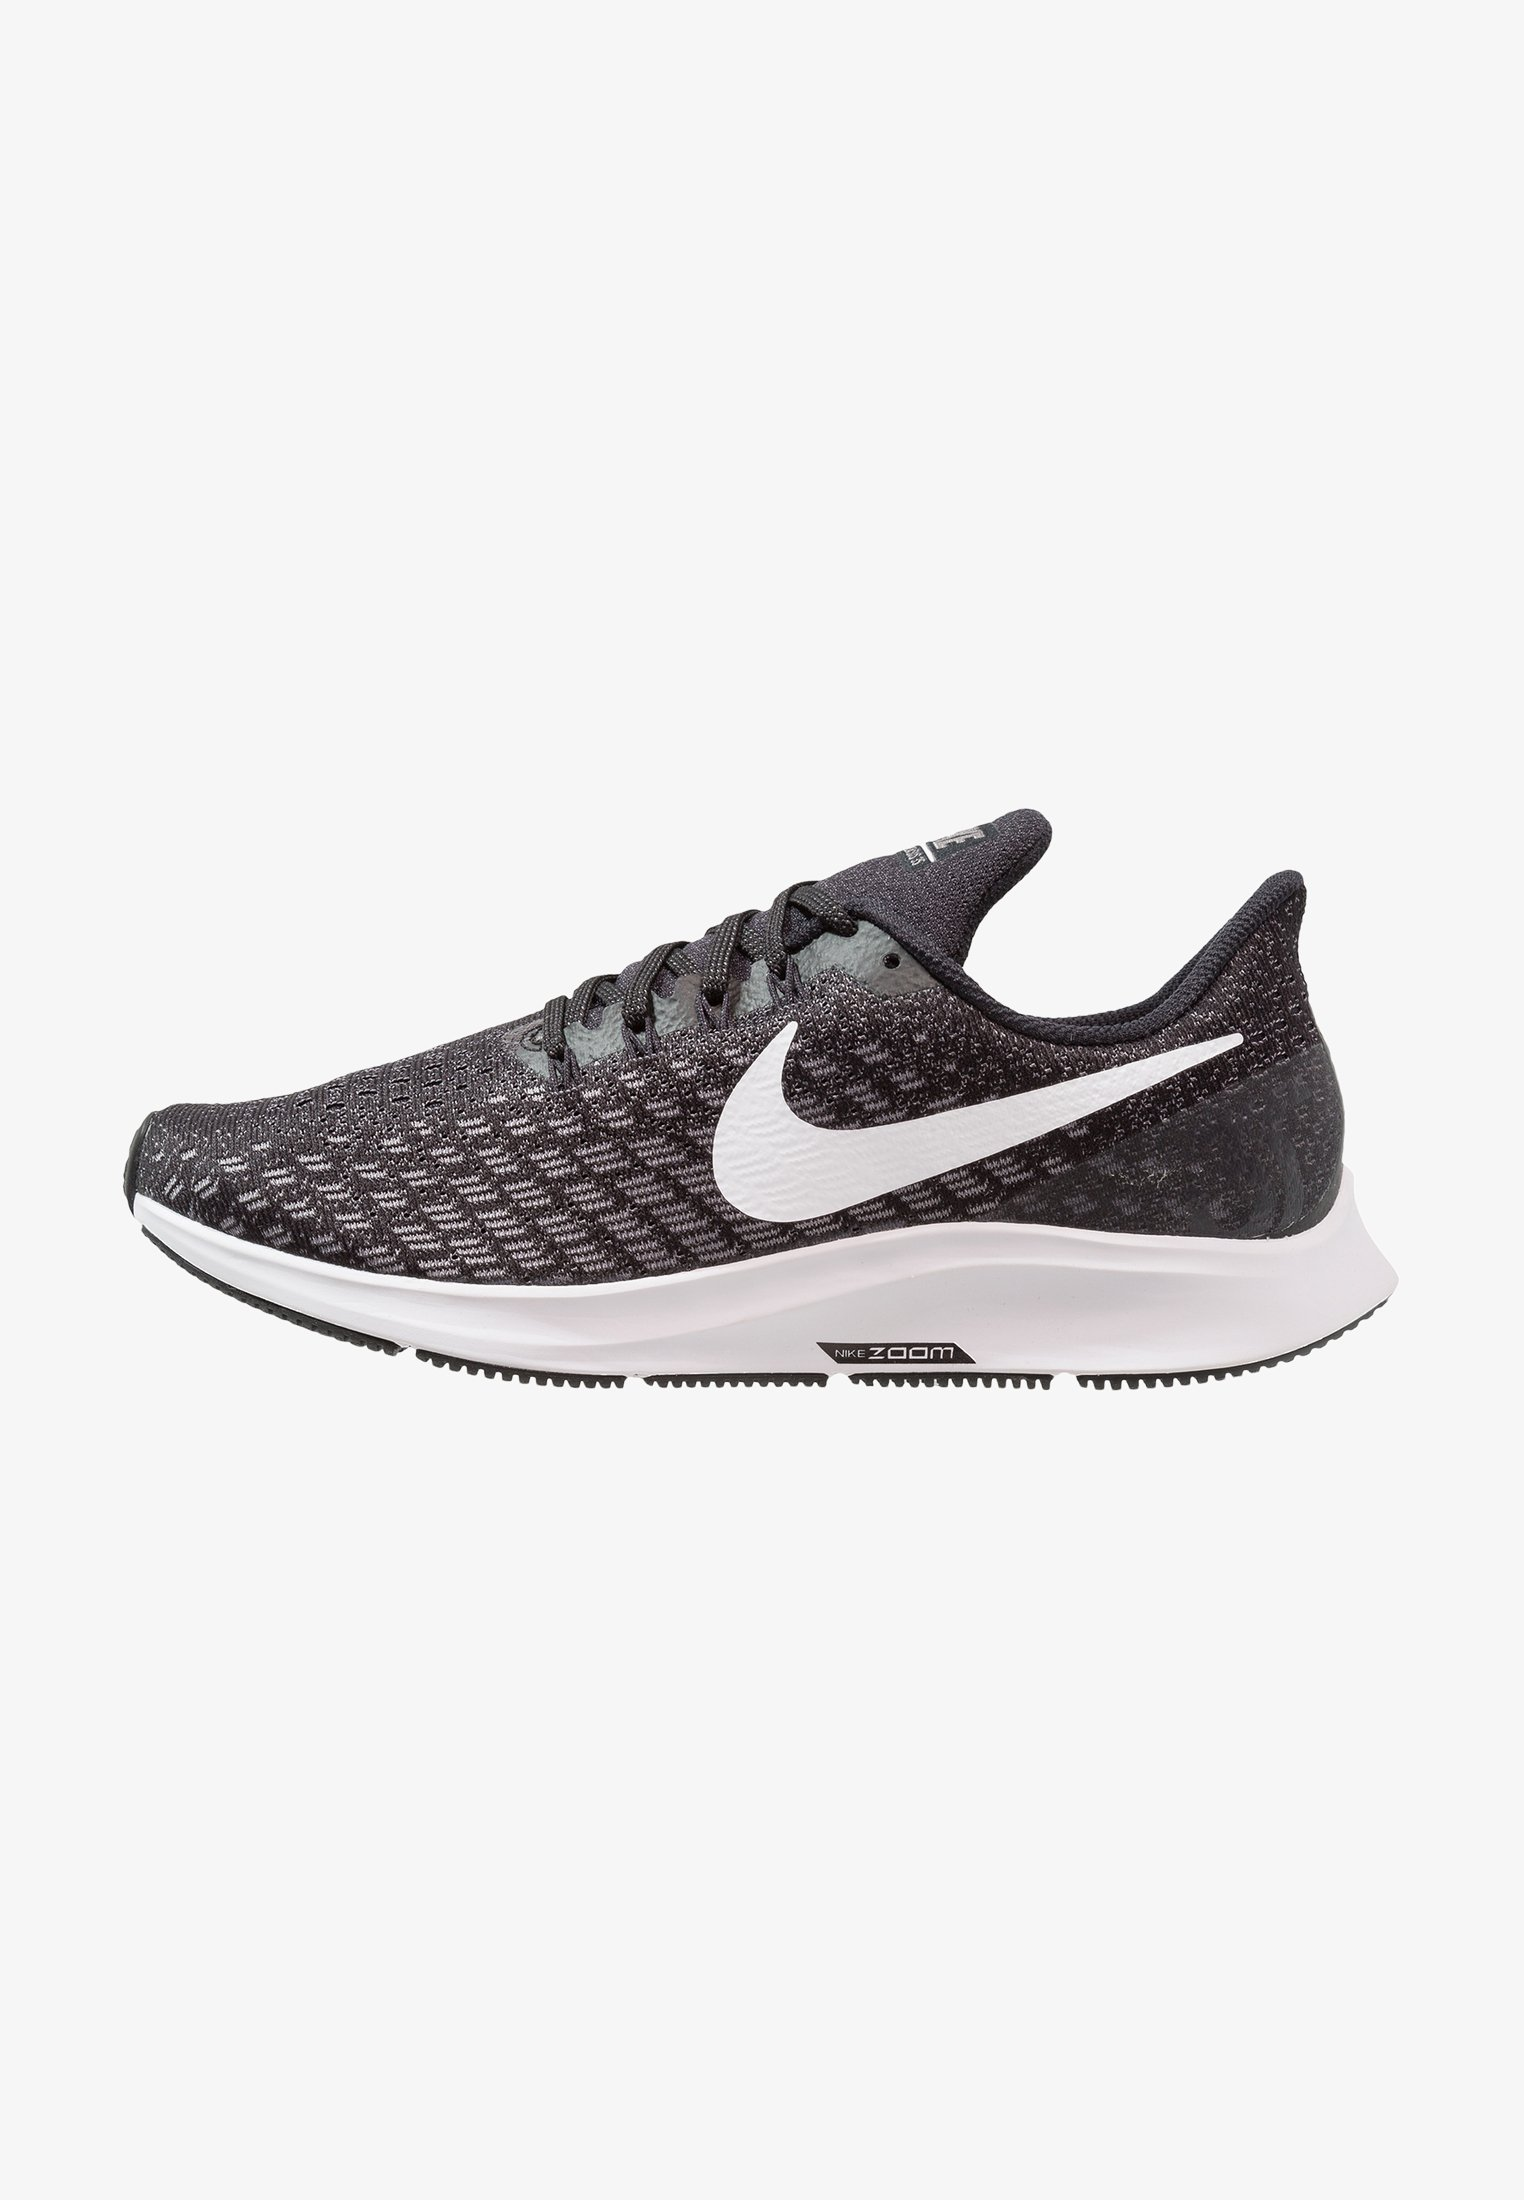 Preservativo cerca Hablar con  Nike Performance AIR ZOOM PEGASUS 35 - Zapatillas de running neutras -  black/white/gunsmoke/oil grey/negro - Zalando.es